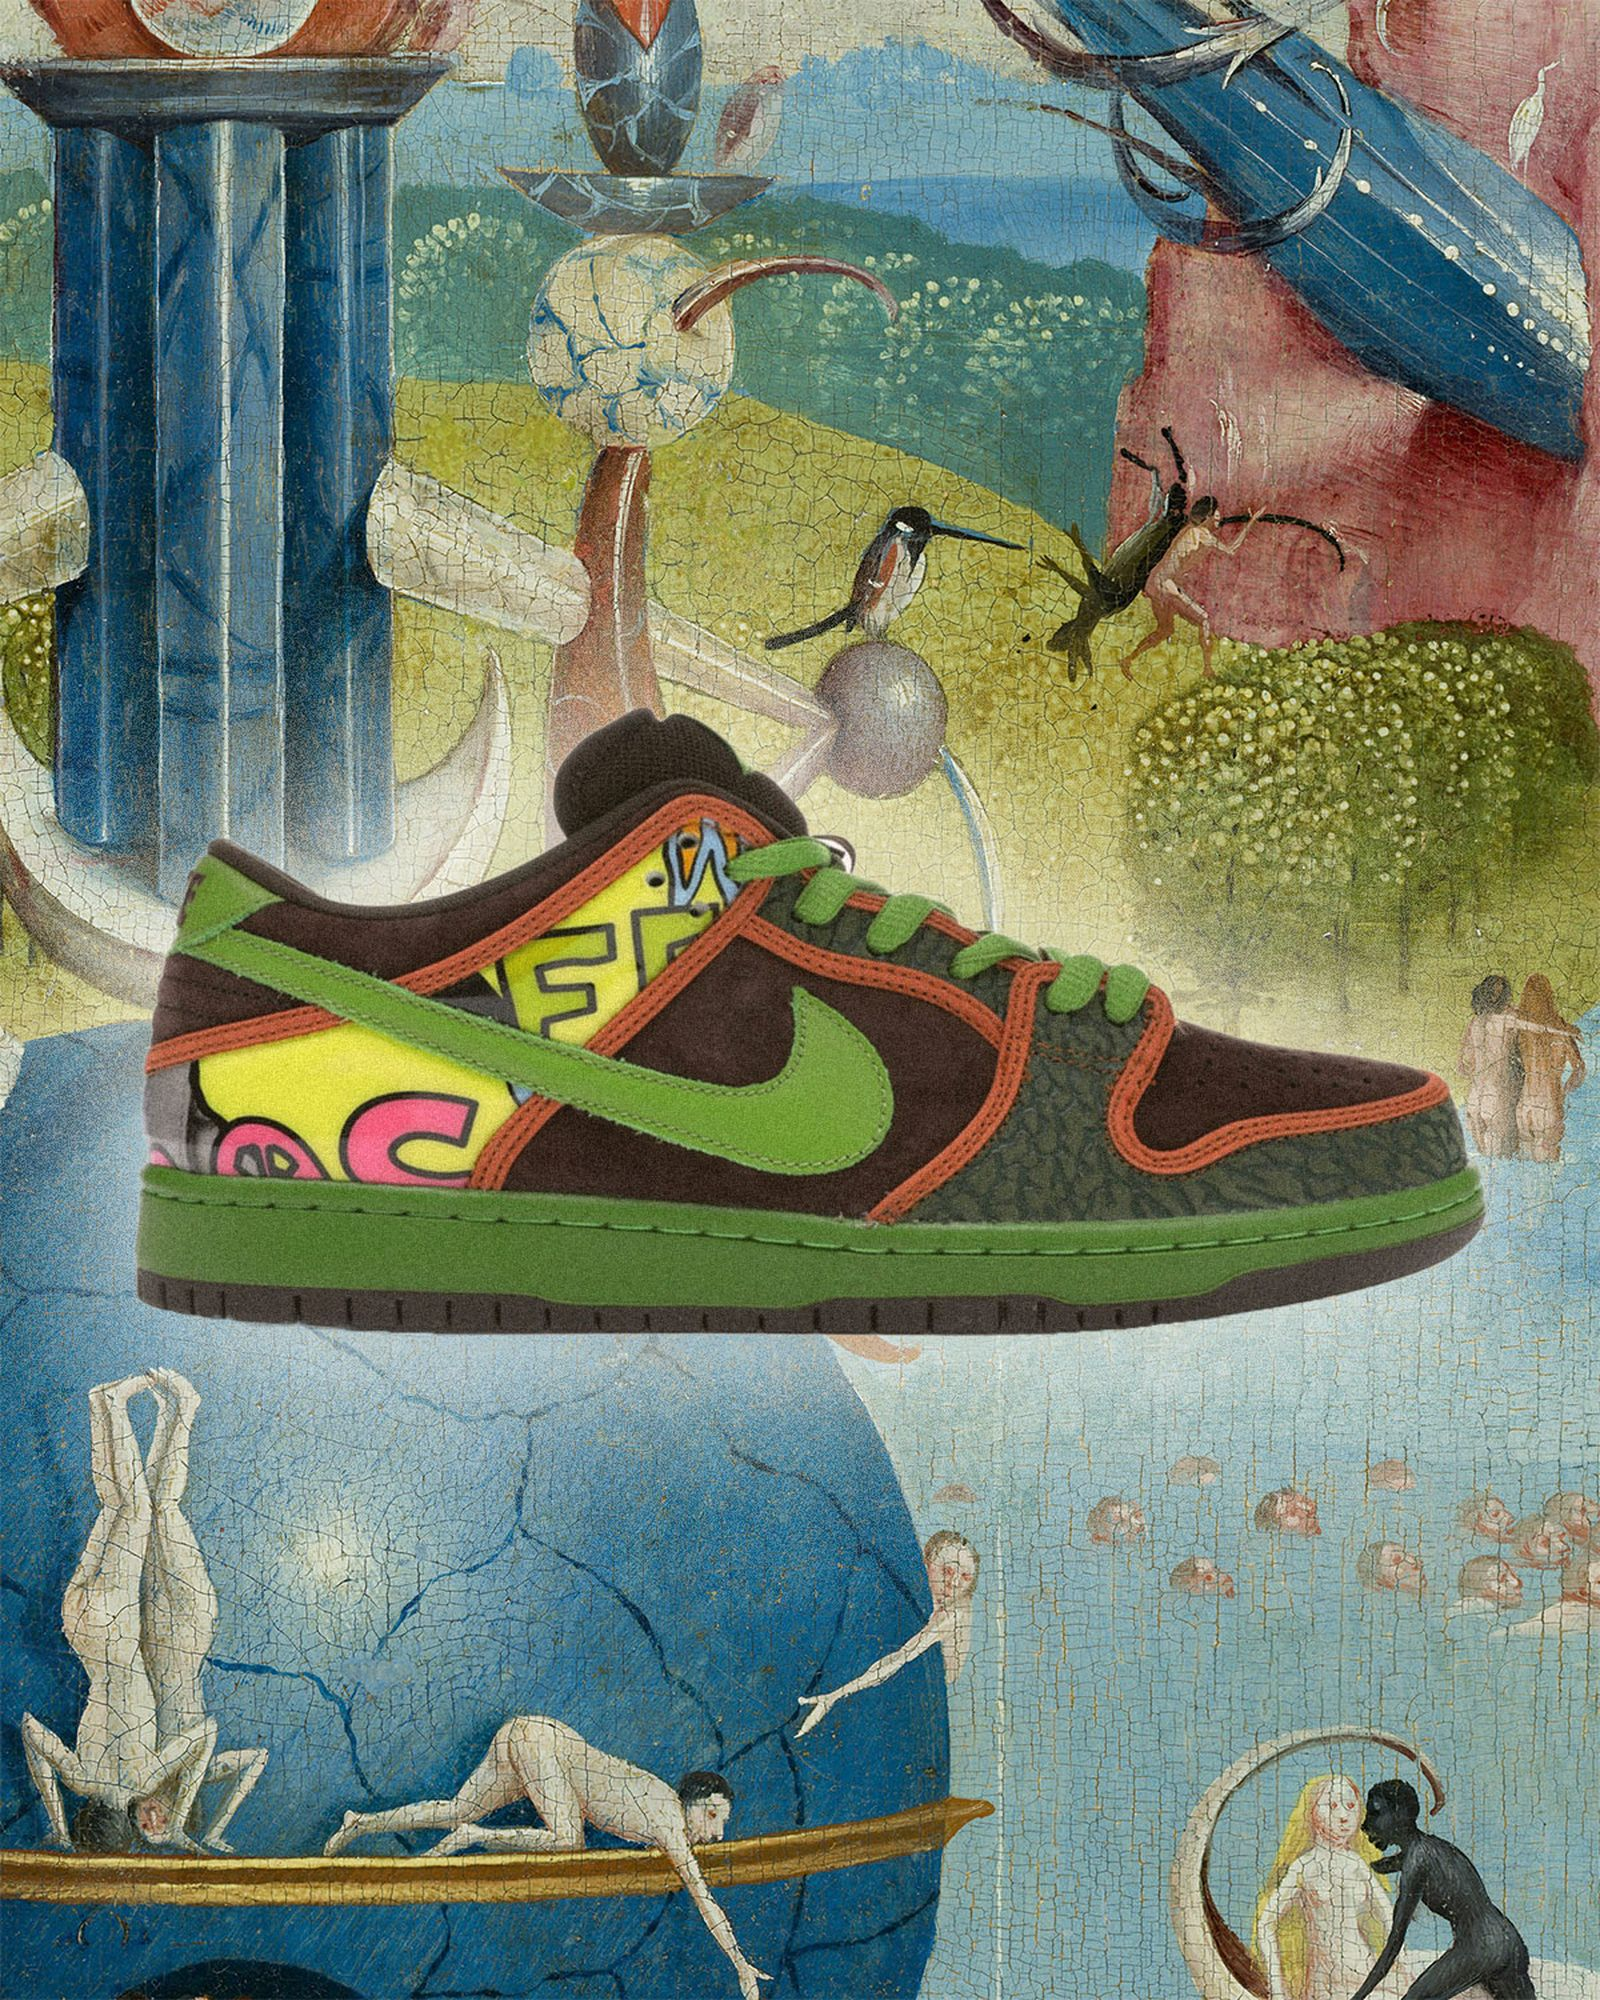 Nike-Dunk-SB-Low-De-La-Soul(2015)